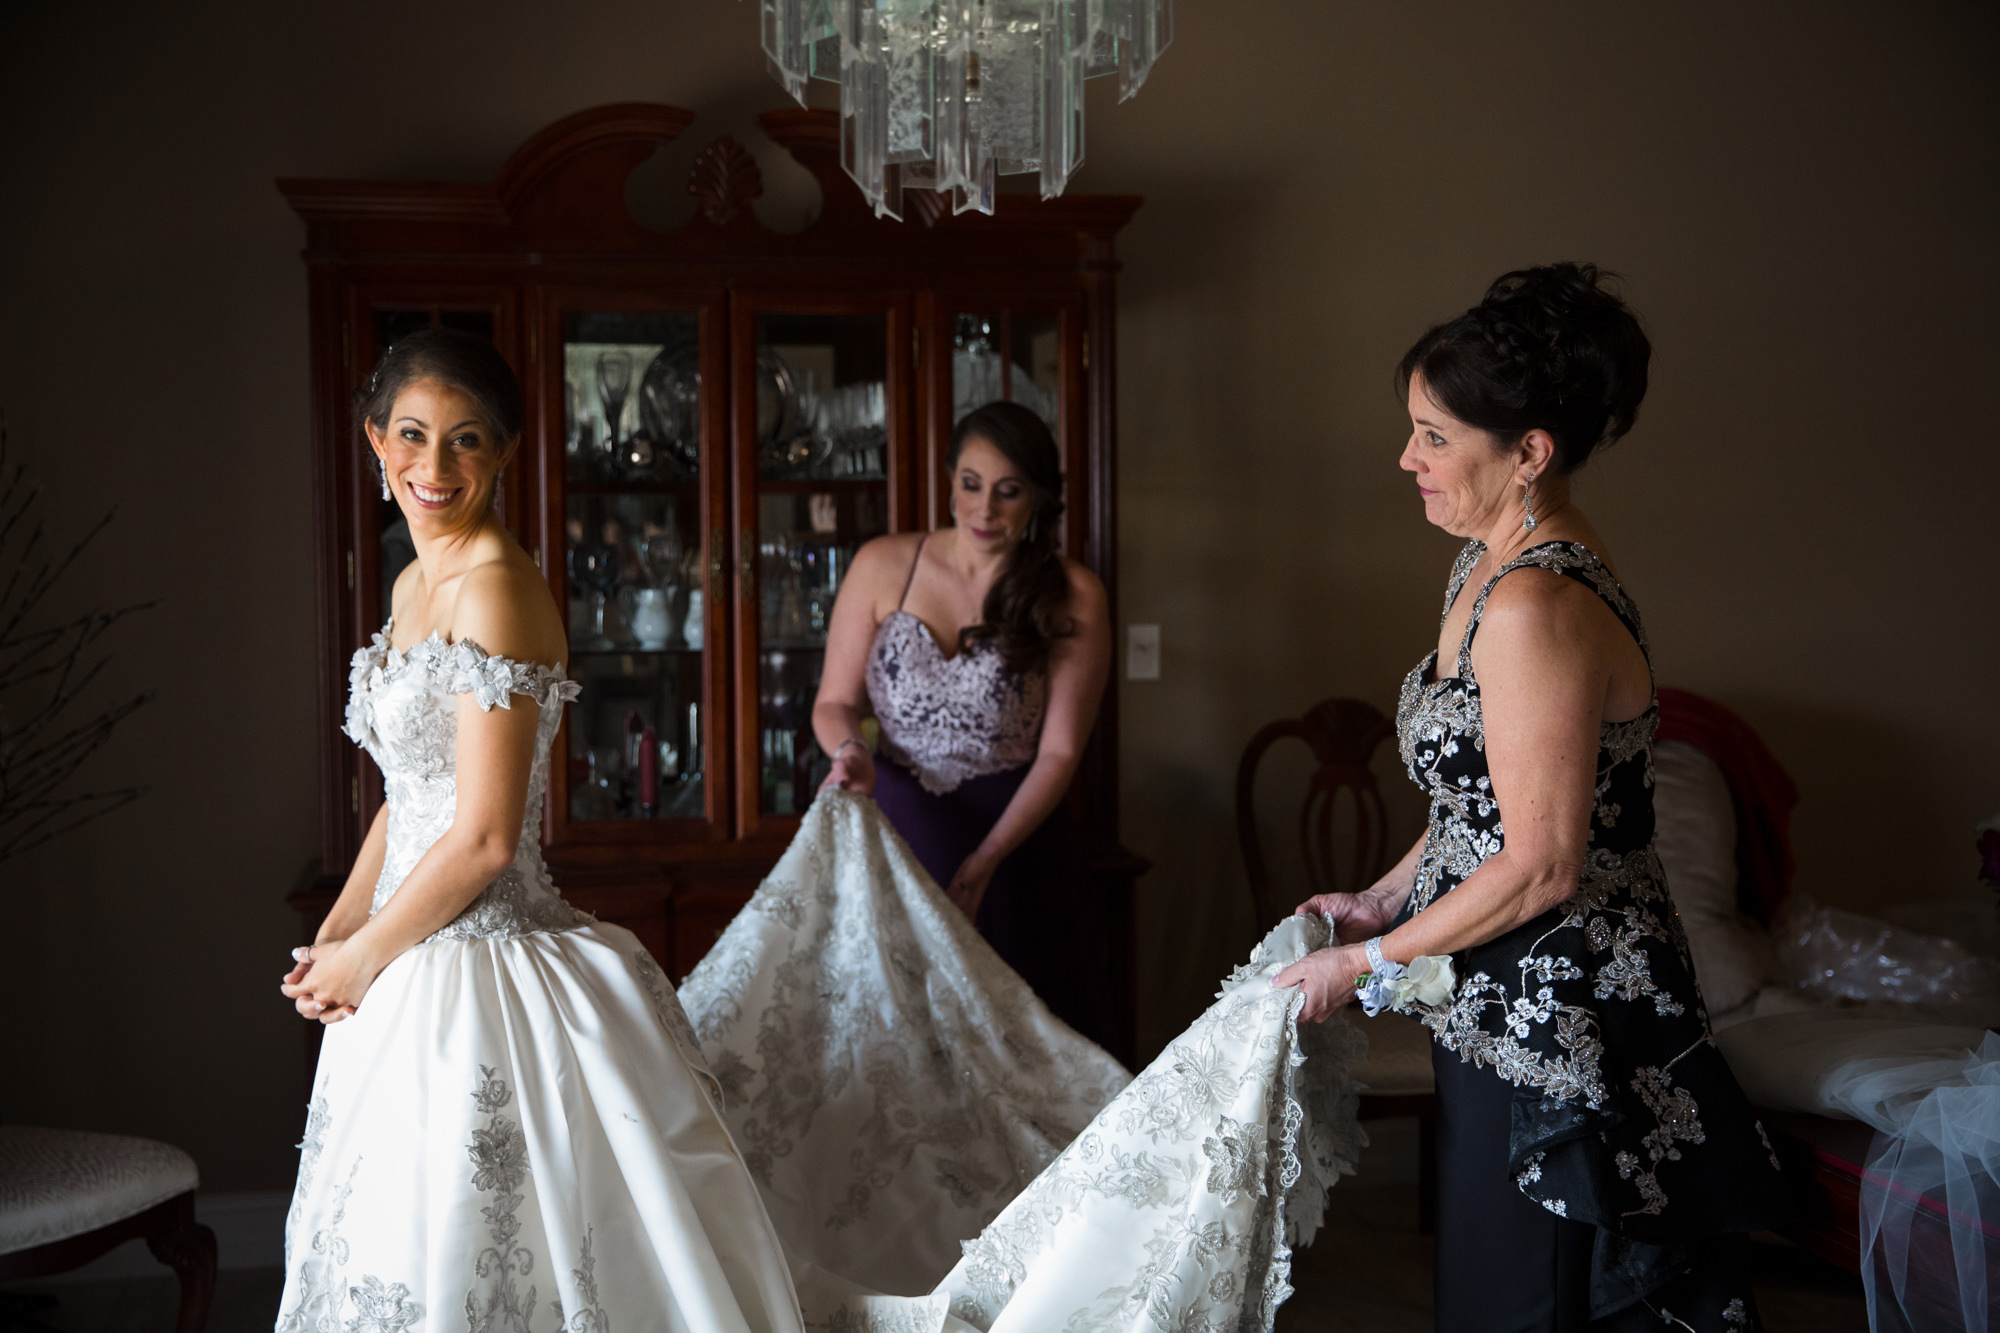 Benvenuto_Wedding_catholic_Florida_Bride-Groom-13.jpg